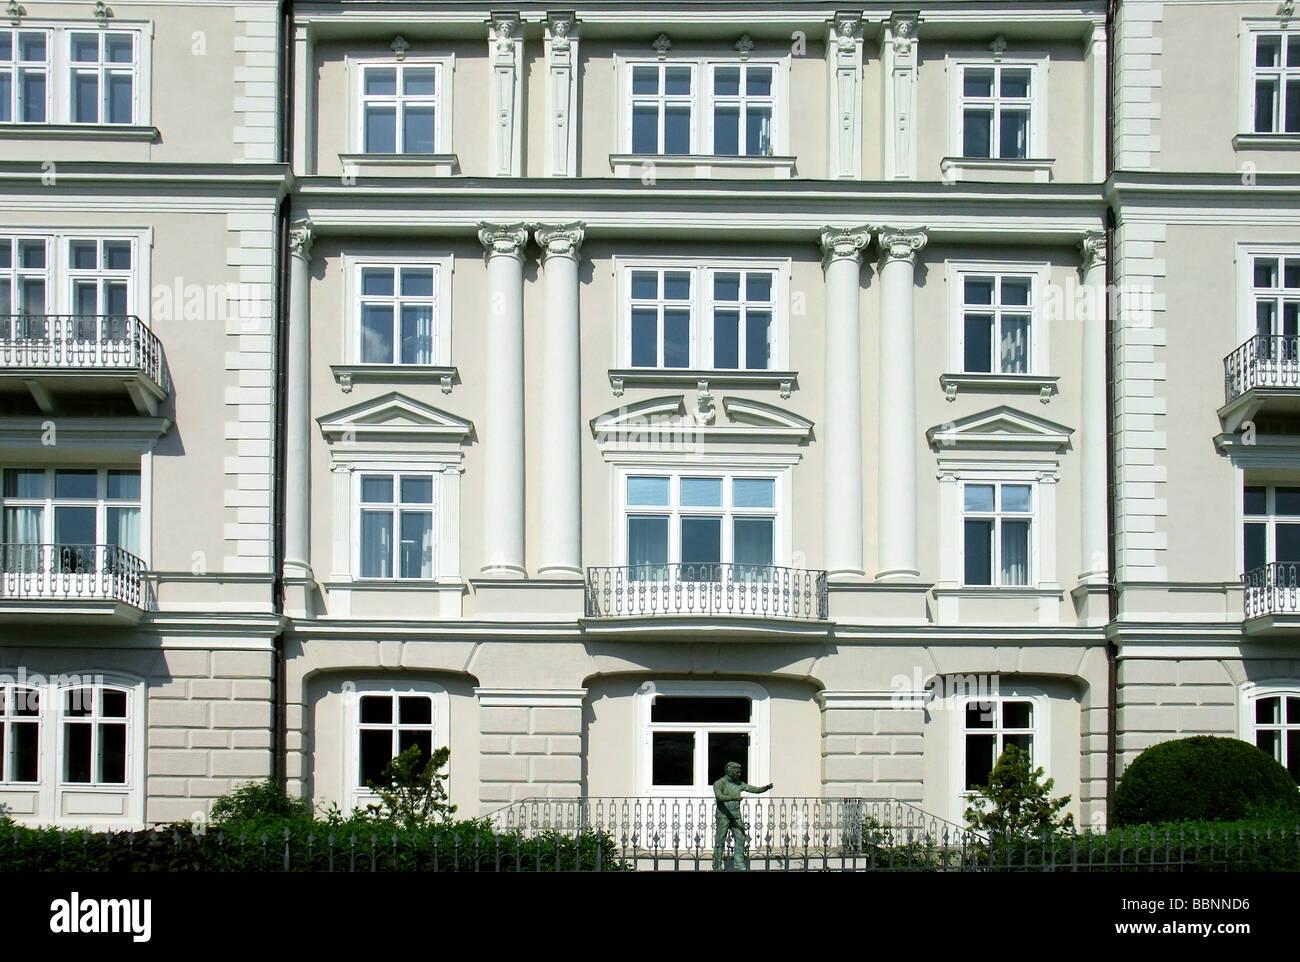 geography / travel, Austria, Salzburg, birth house of Herbert von Karajan, exterior view, Additional-Rights-Clearance - Stock Image